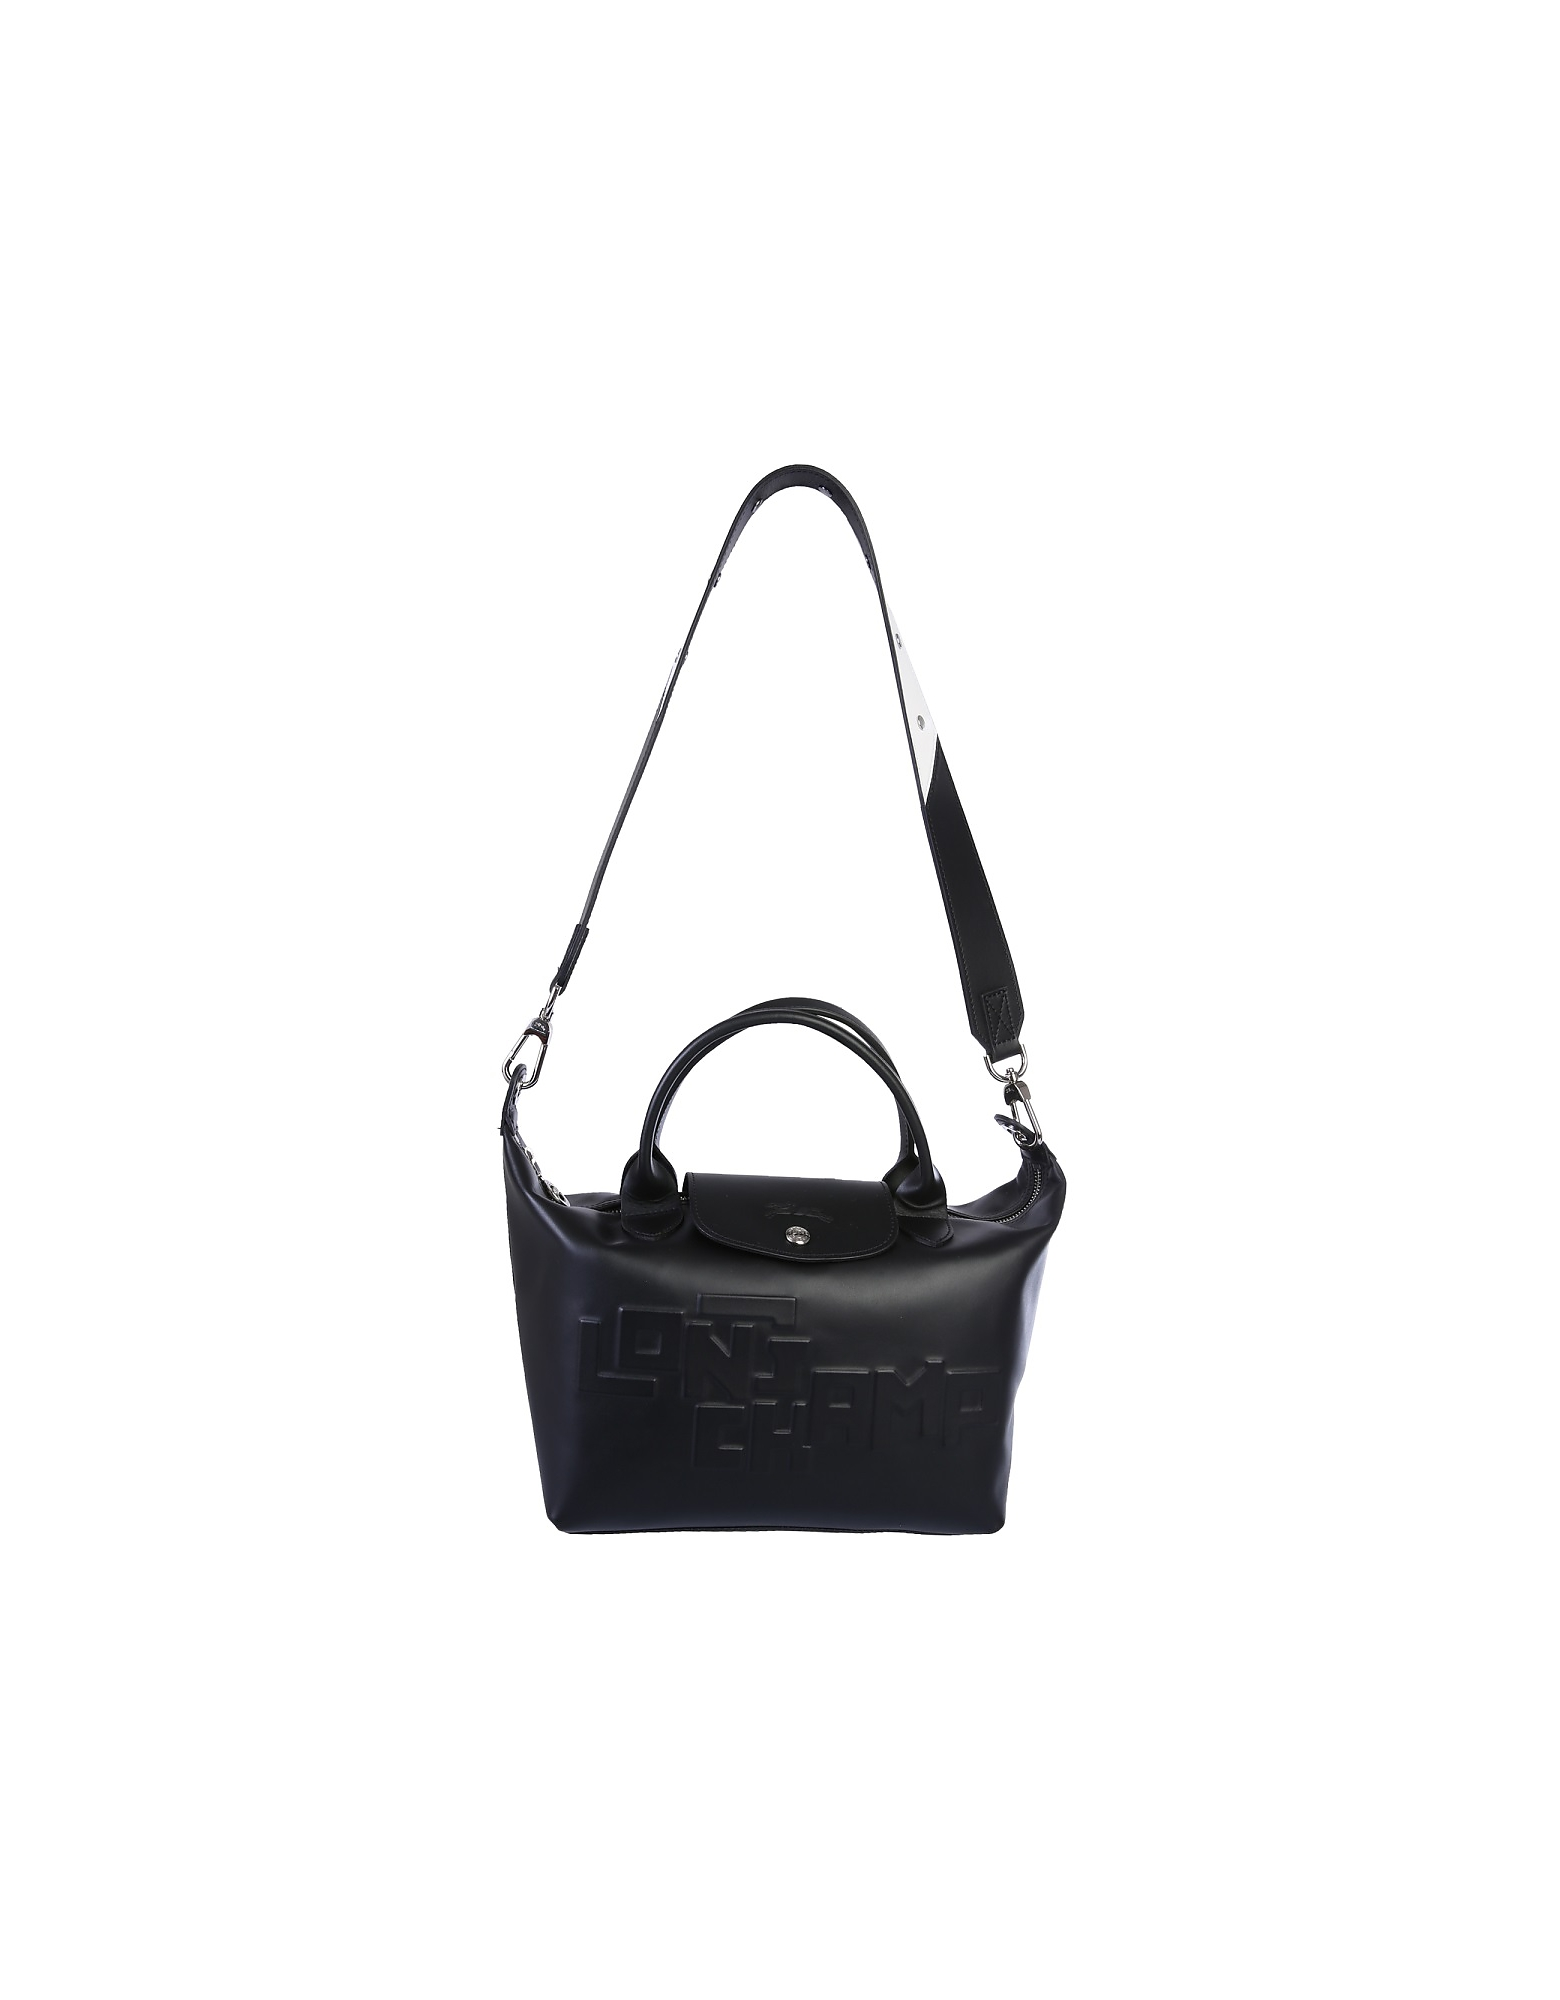 Longchamp Designer Handbags, Black Le Pliage Bag